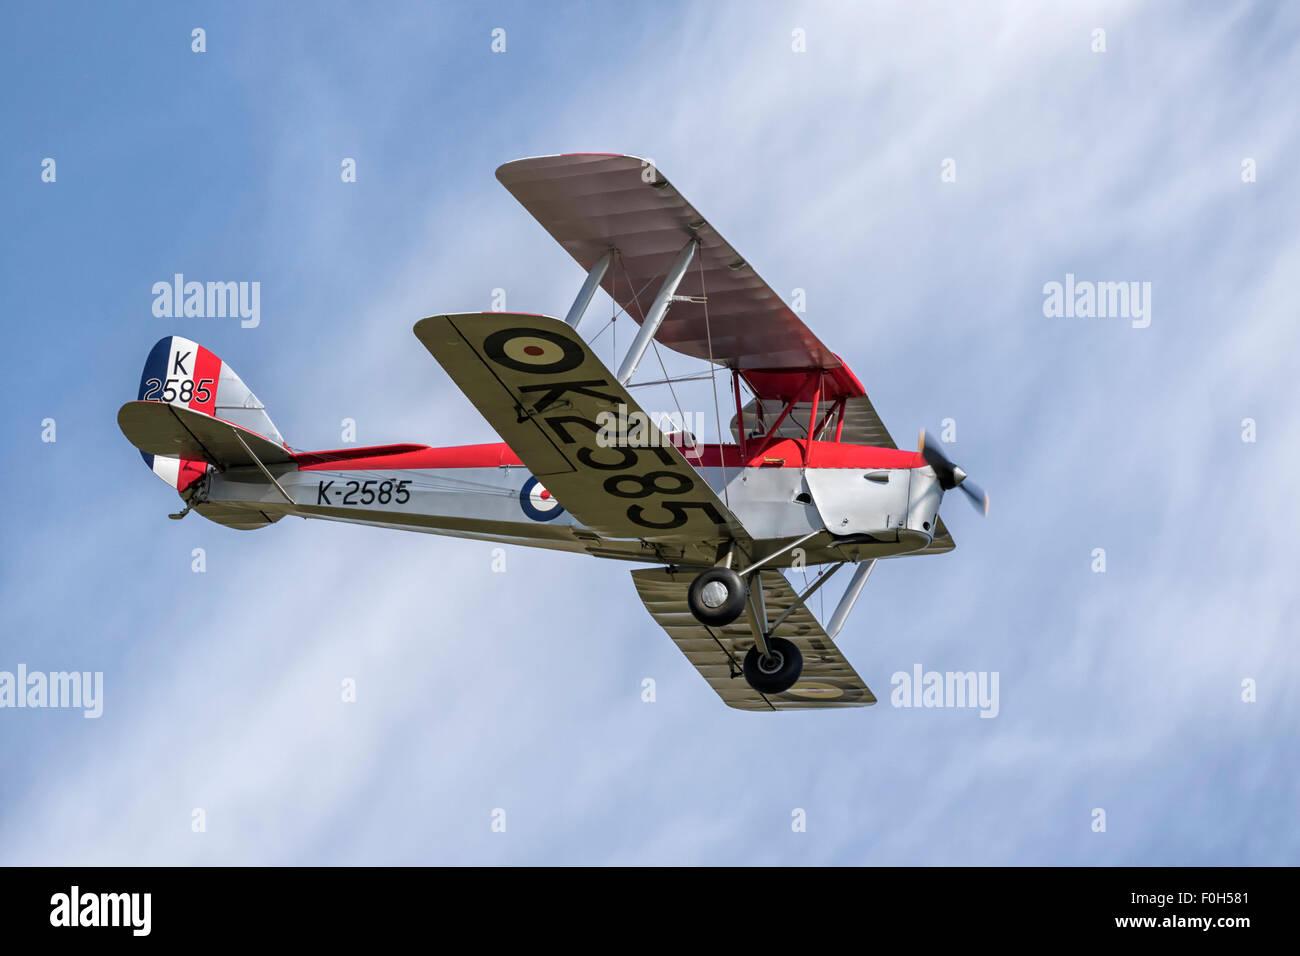 De Havilland DH82 Tiger Moth WW2 bi-plane trainer - Stock Image